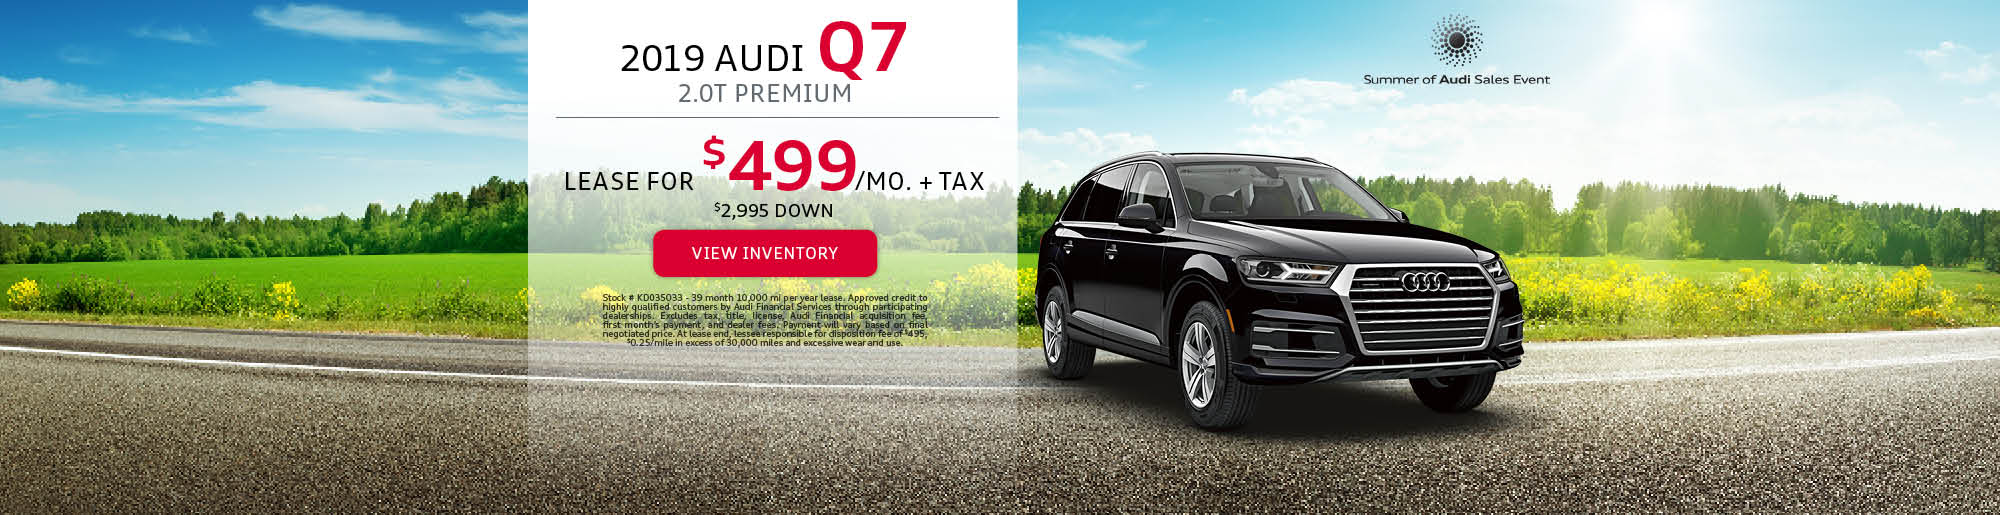 Audi Birmingham: Luxury Car Dealership in Irondale, AL